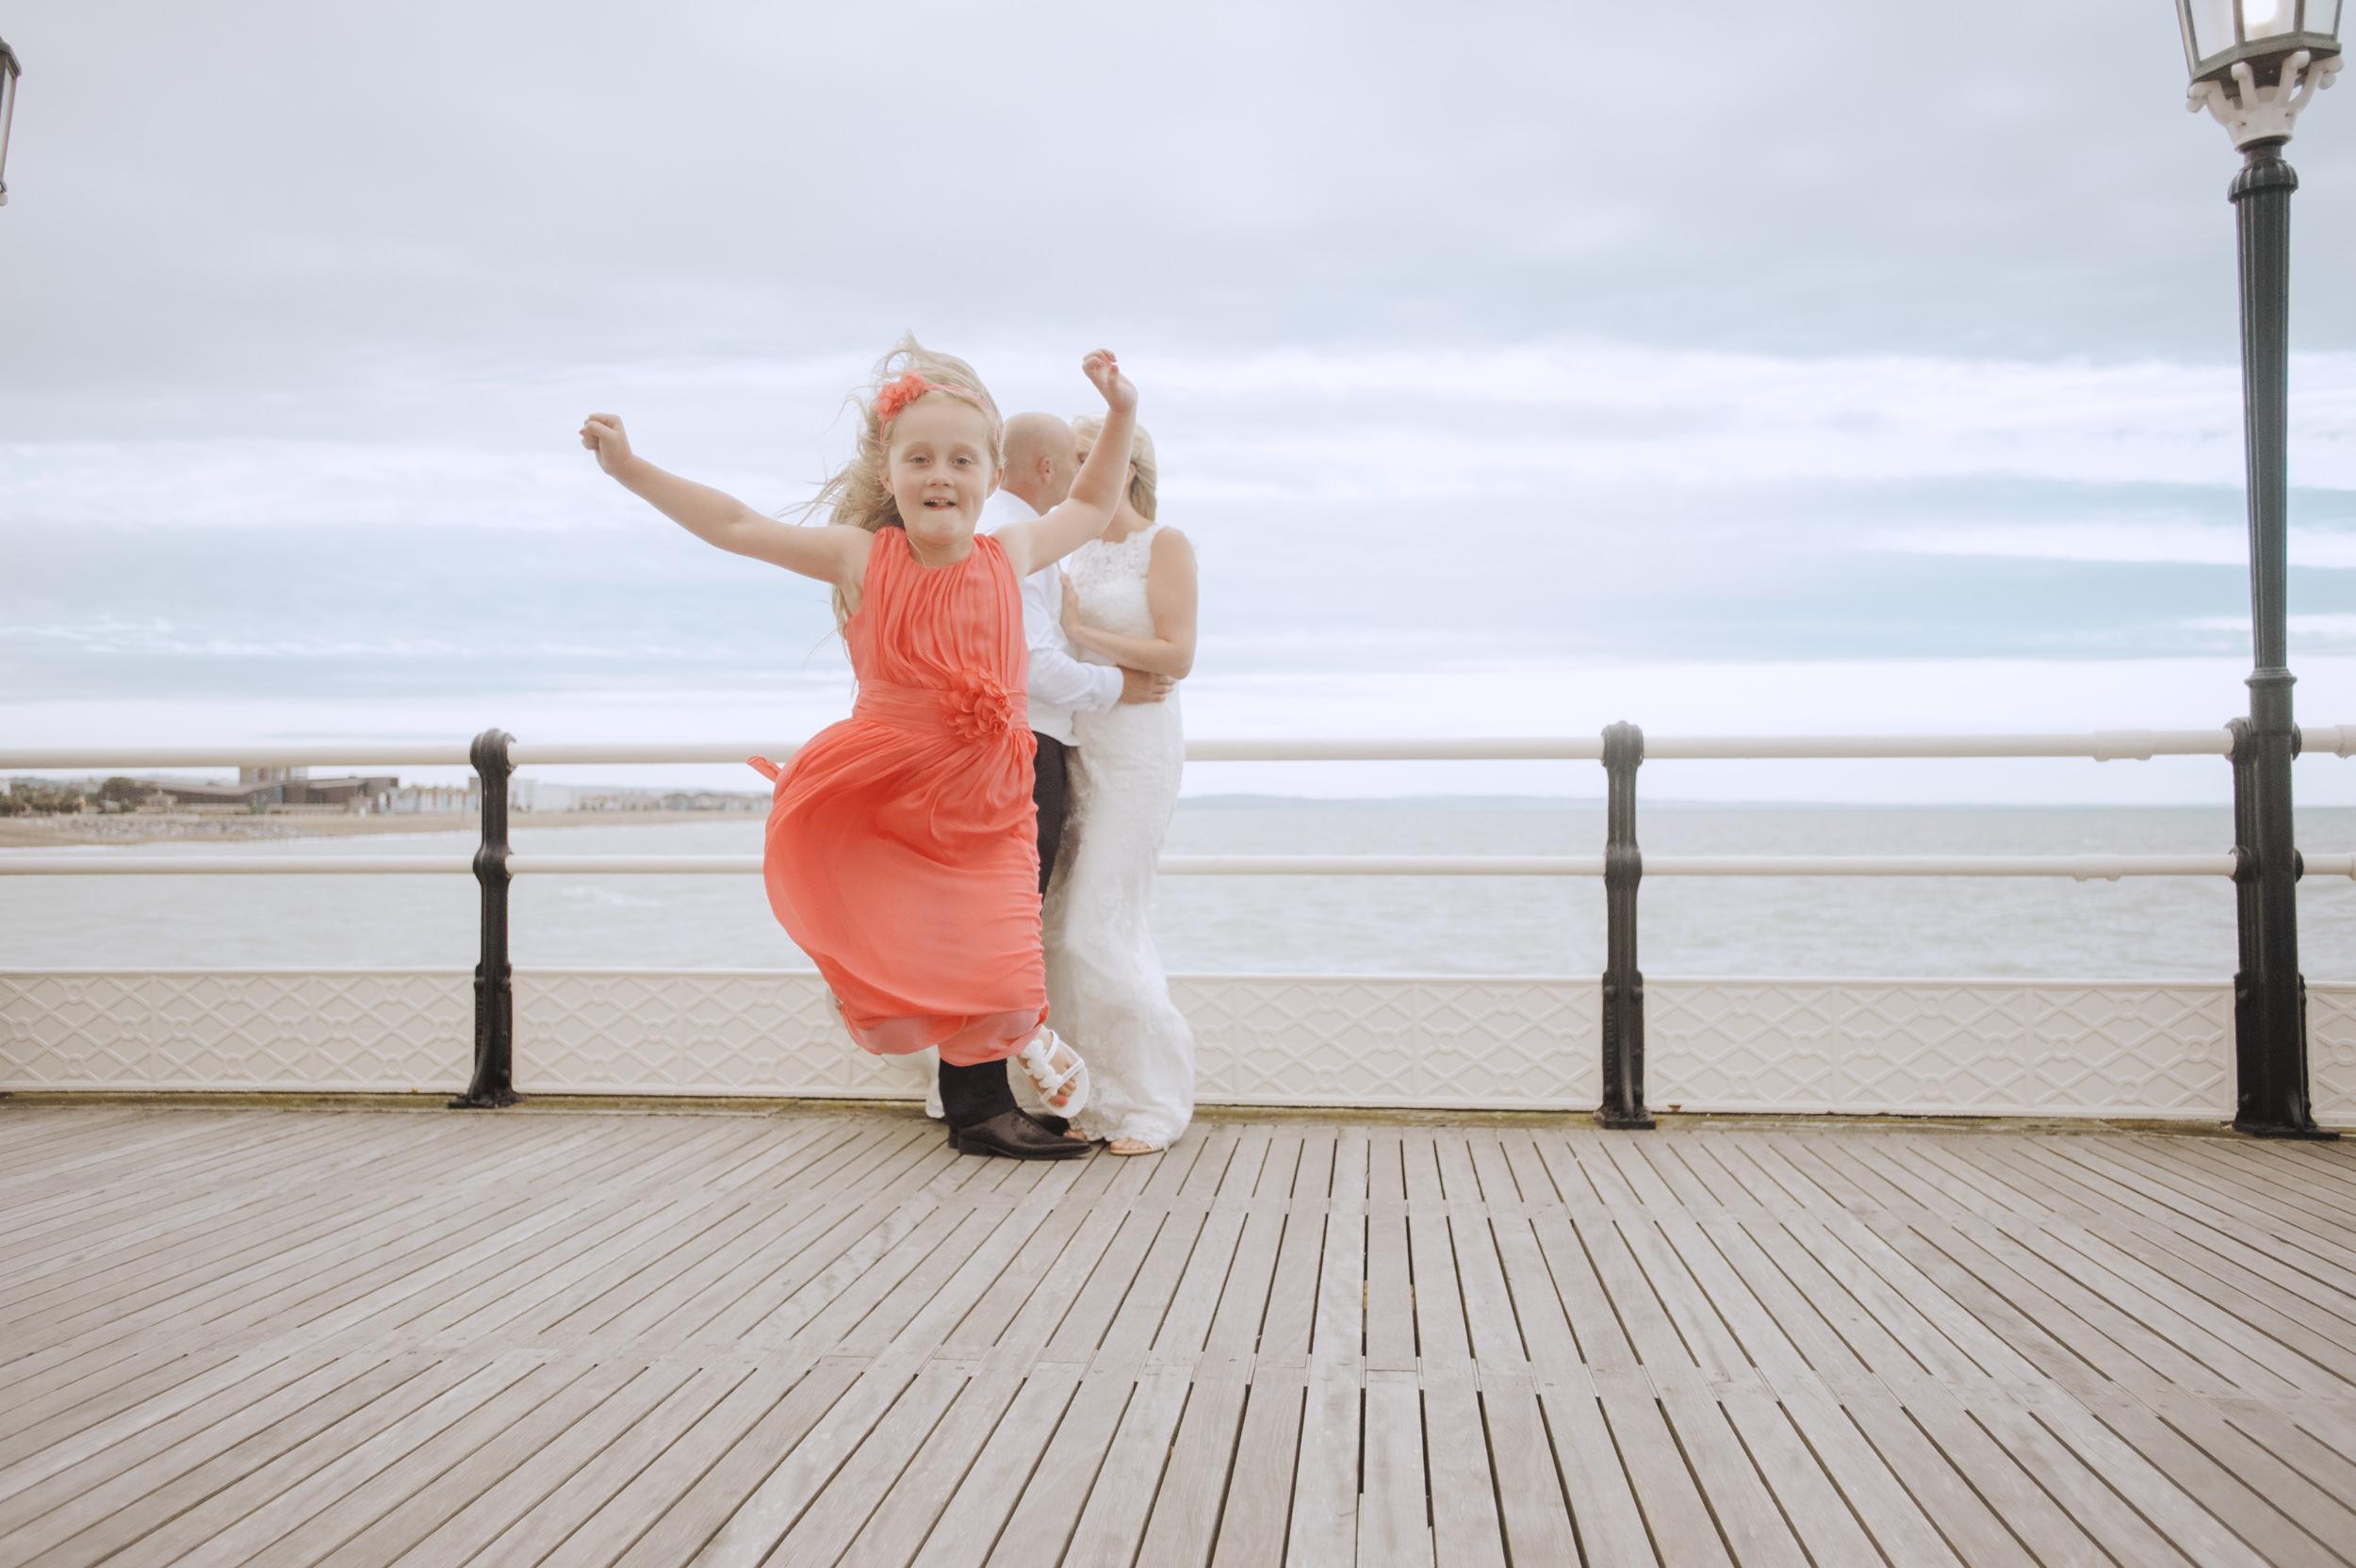 worthing-pier-wedding-023.JPG